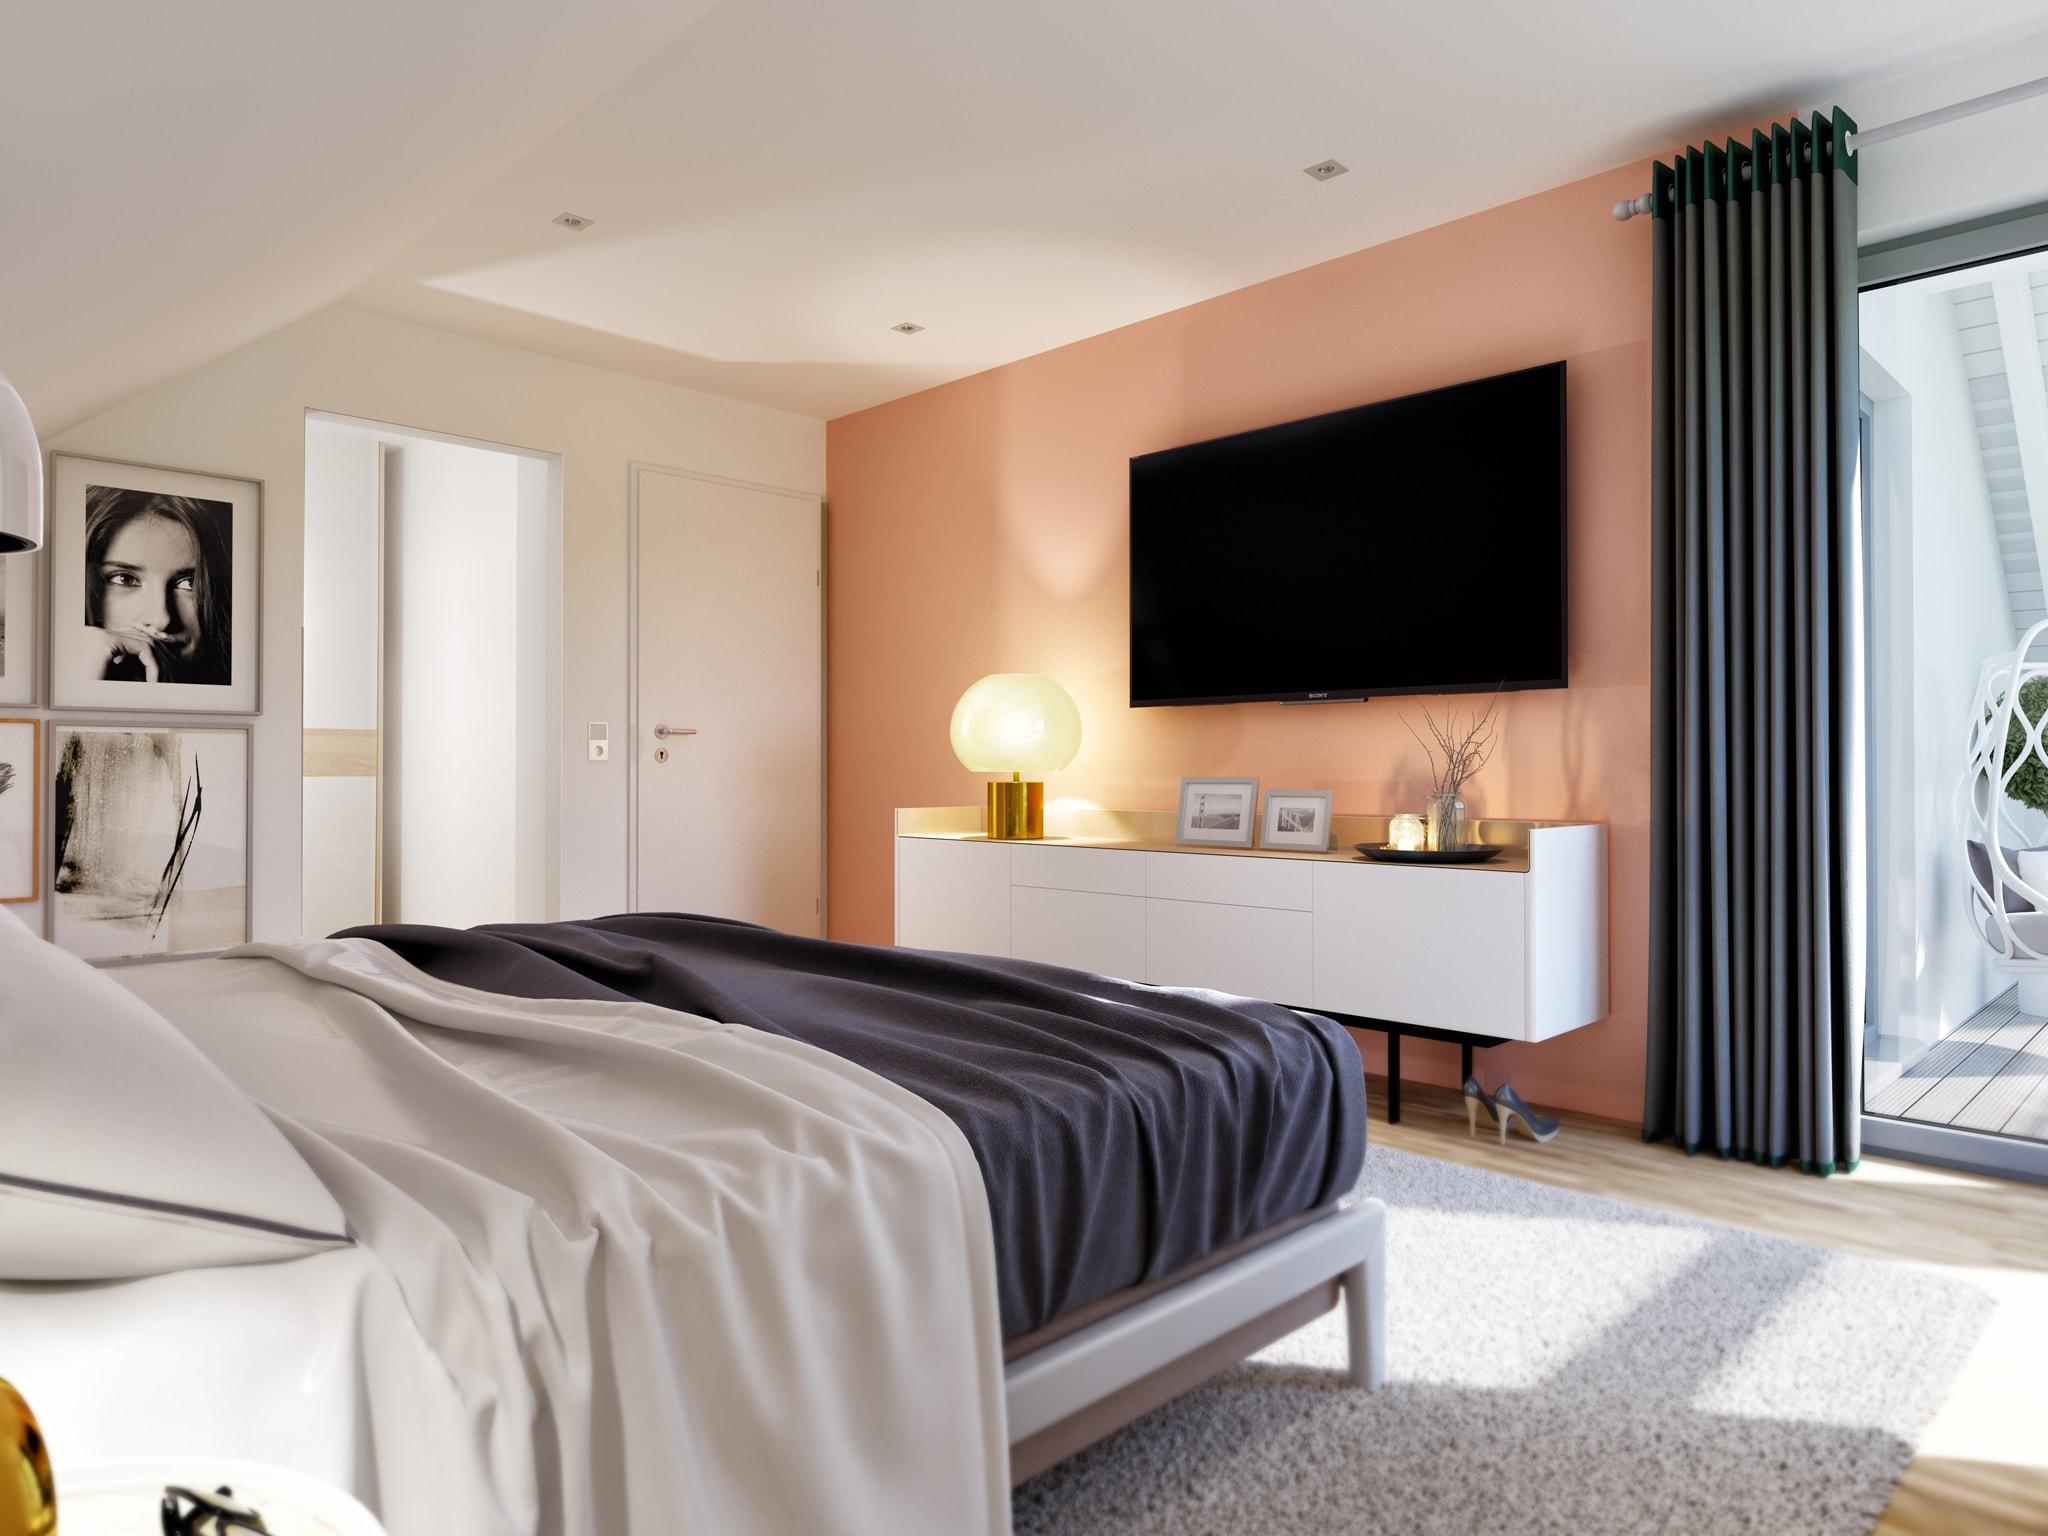 Schlafzimmer Ideen - Einfamilienhaus Inneneinrichtung Fertighaus Living Haus SUNSHINE 143 V3 - HausbauDirekt.de